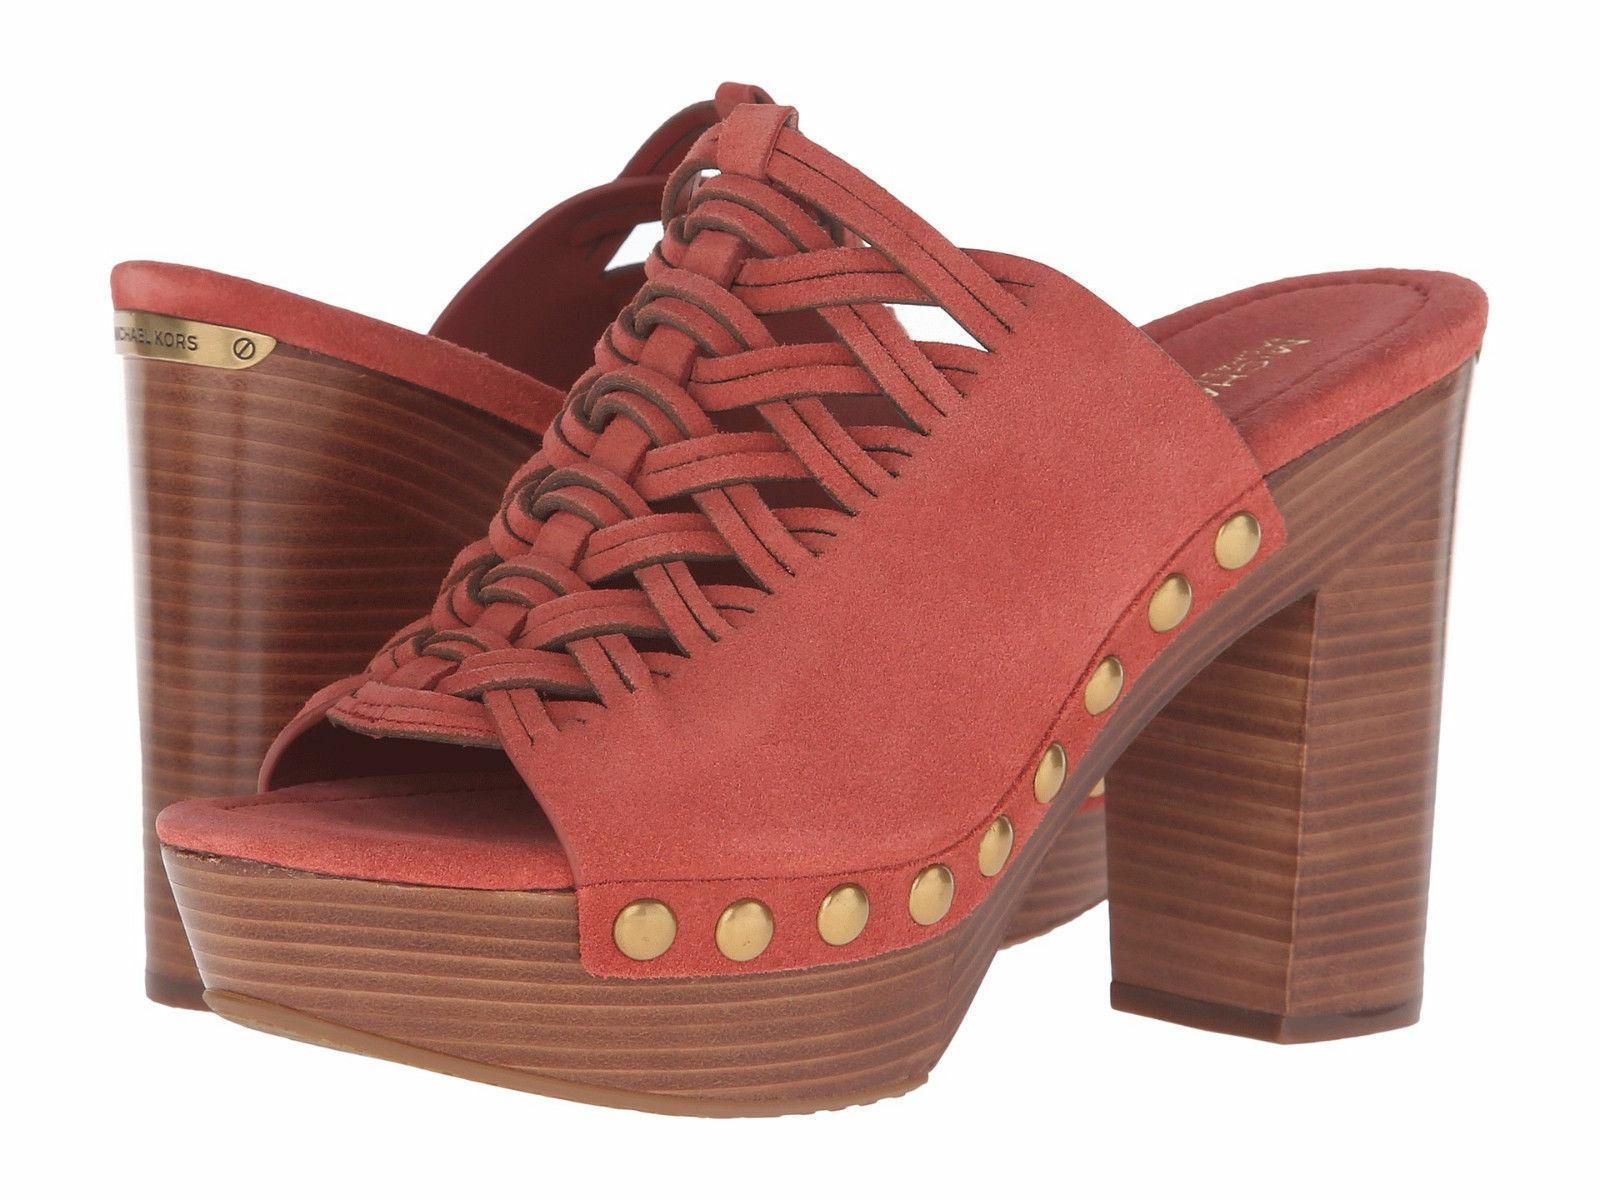 New Michael Kors Women Westley Studs Platform Mules Variety Color&Sizes